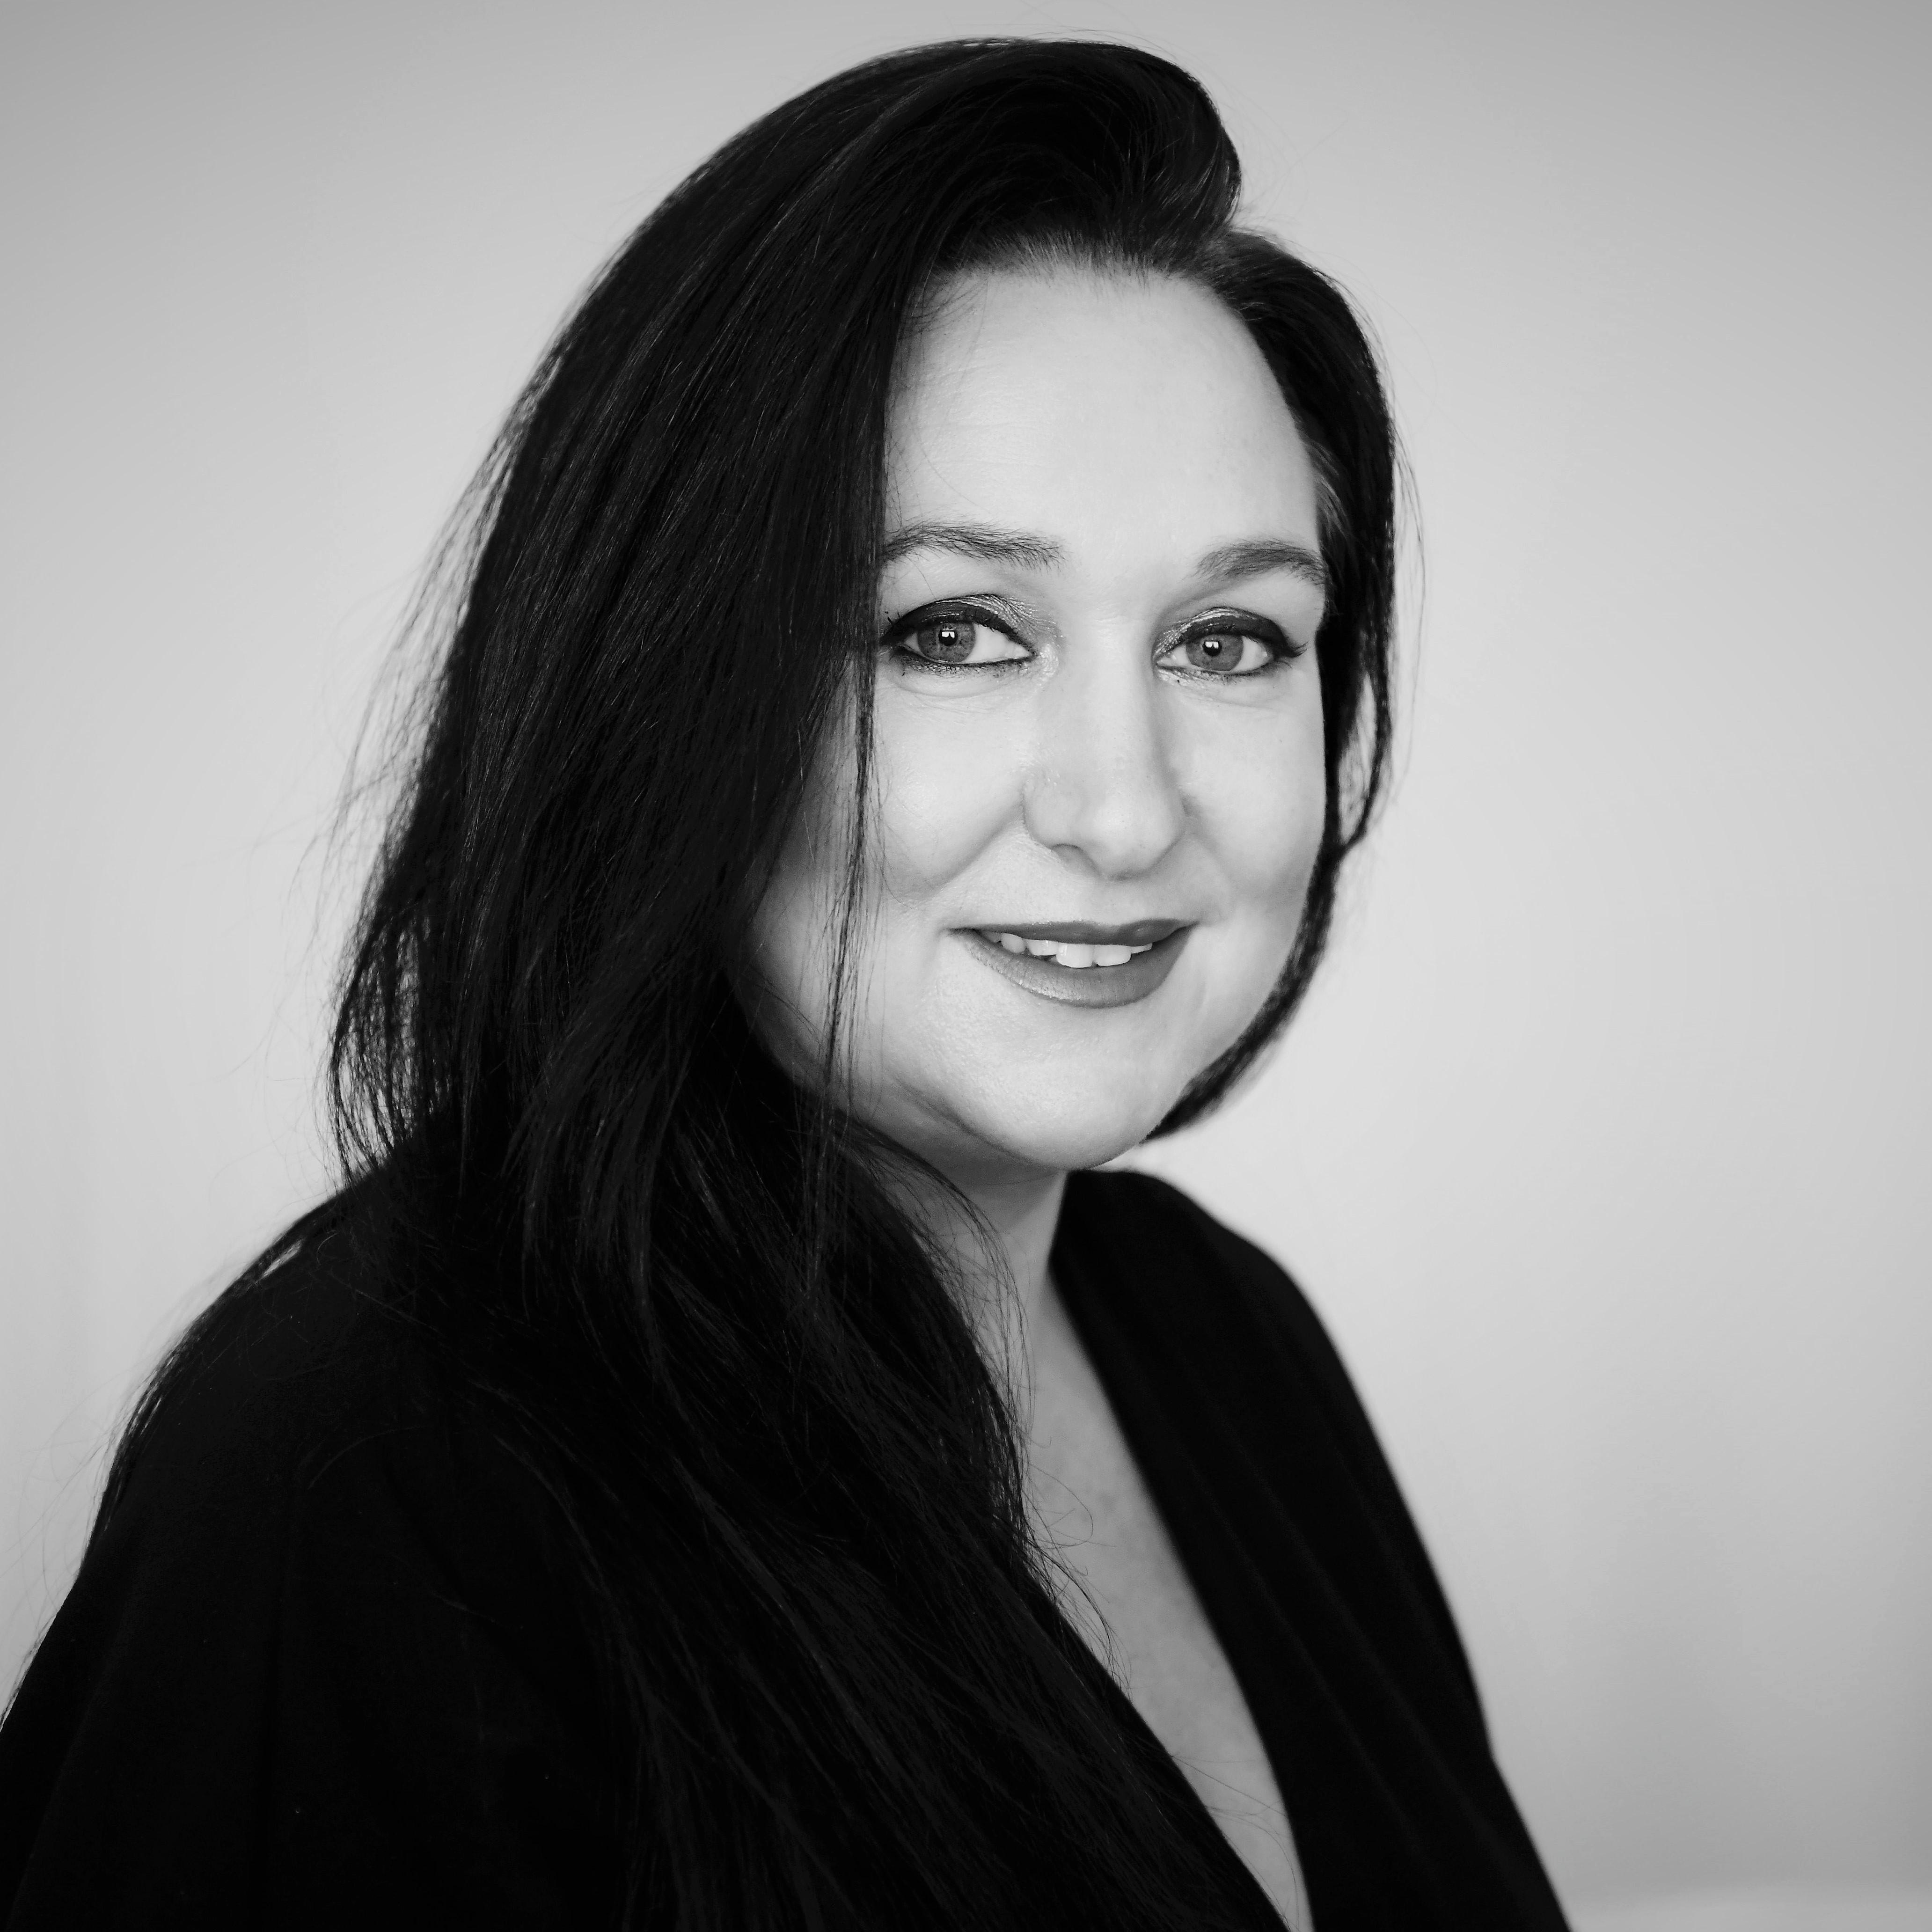 Clara McDonagh